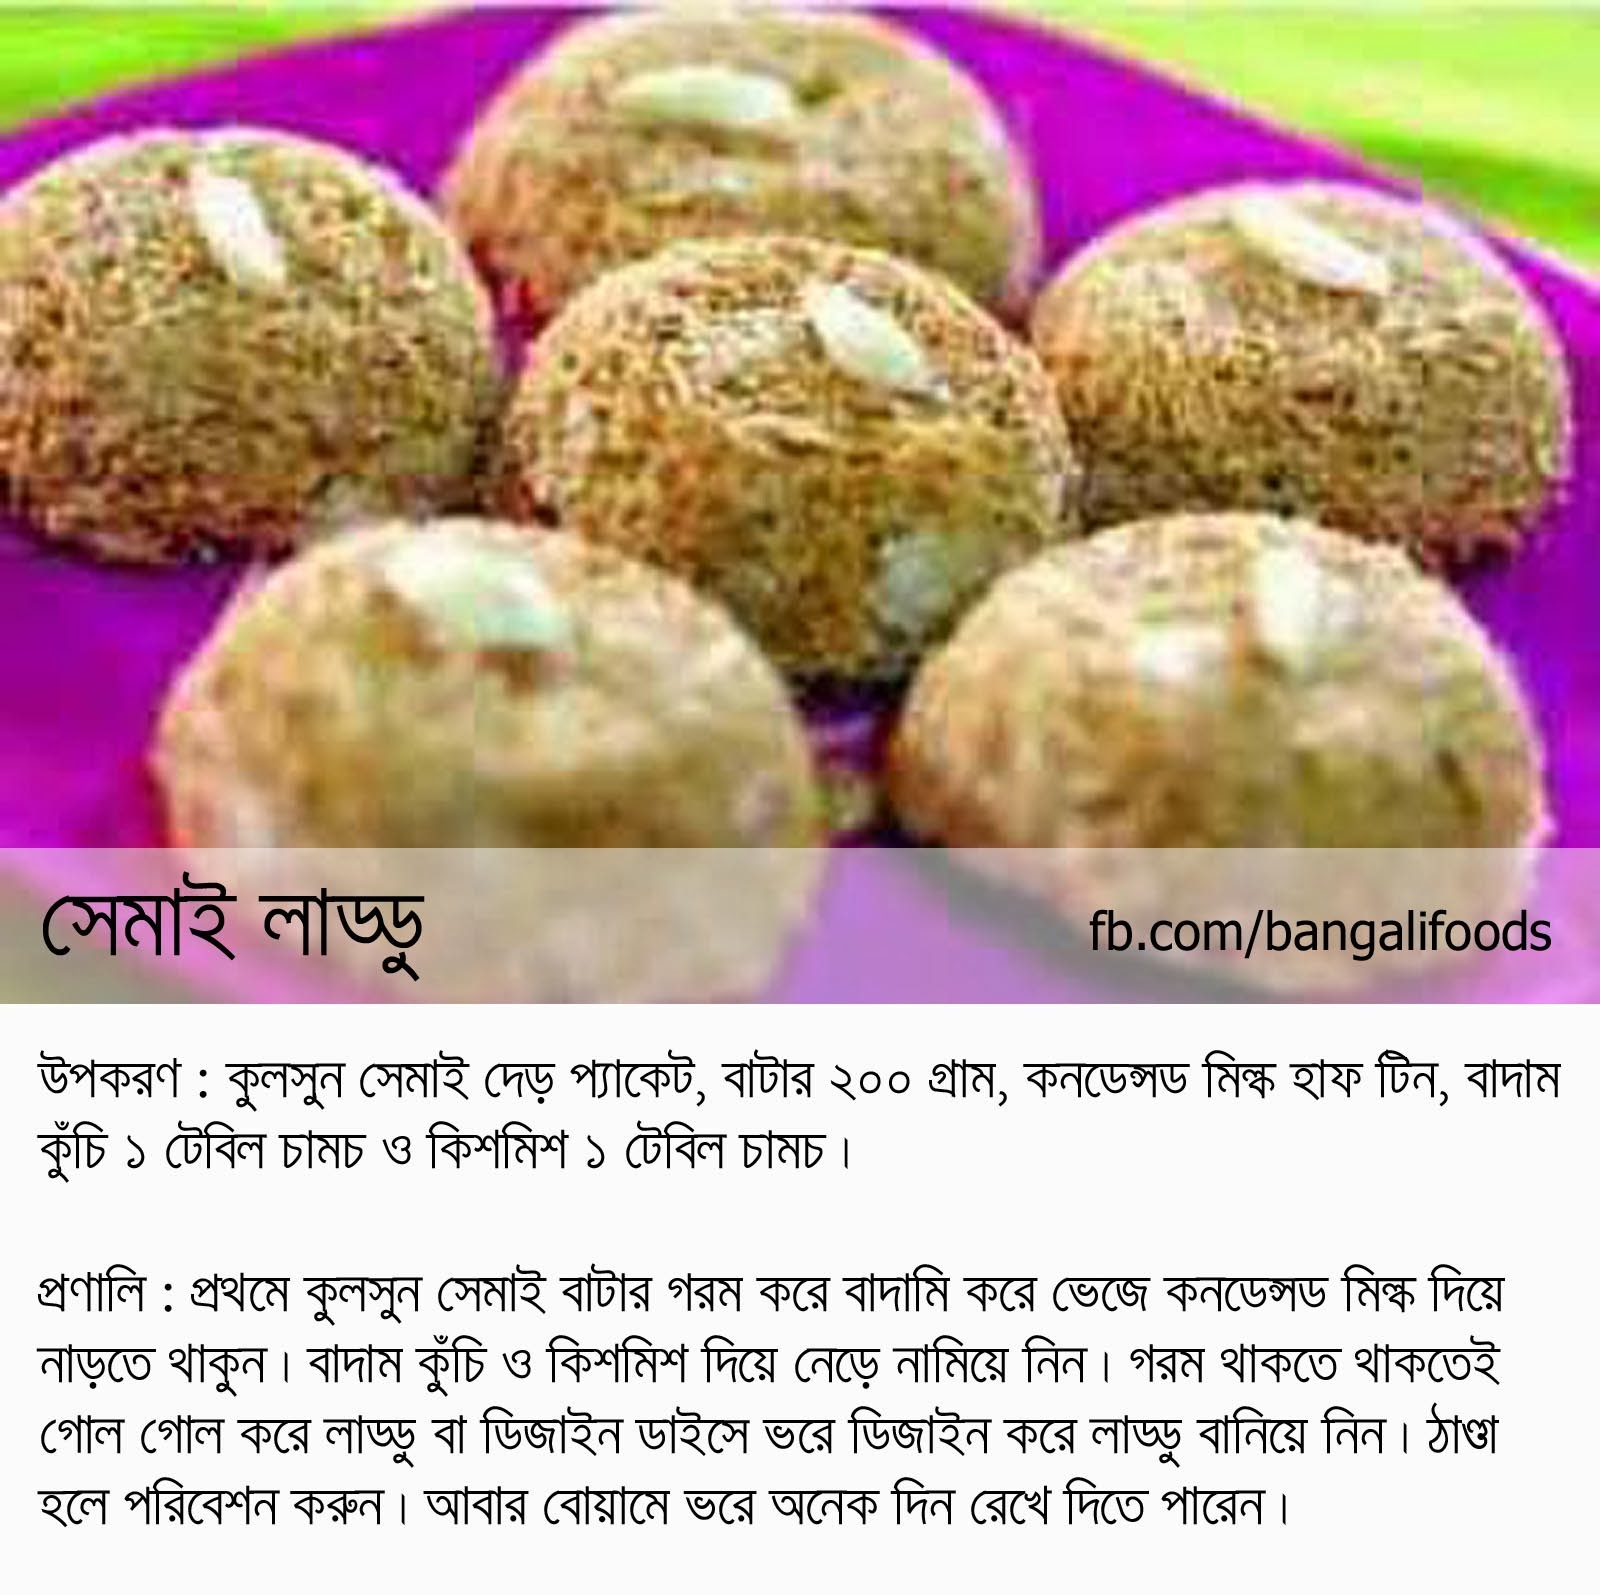 Bangali foods laddu recipes vermicelli laddu forumfinder Image collections